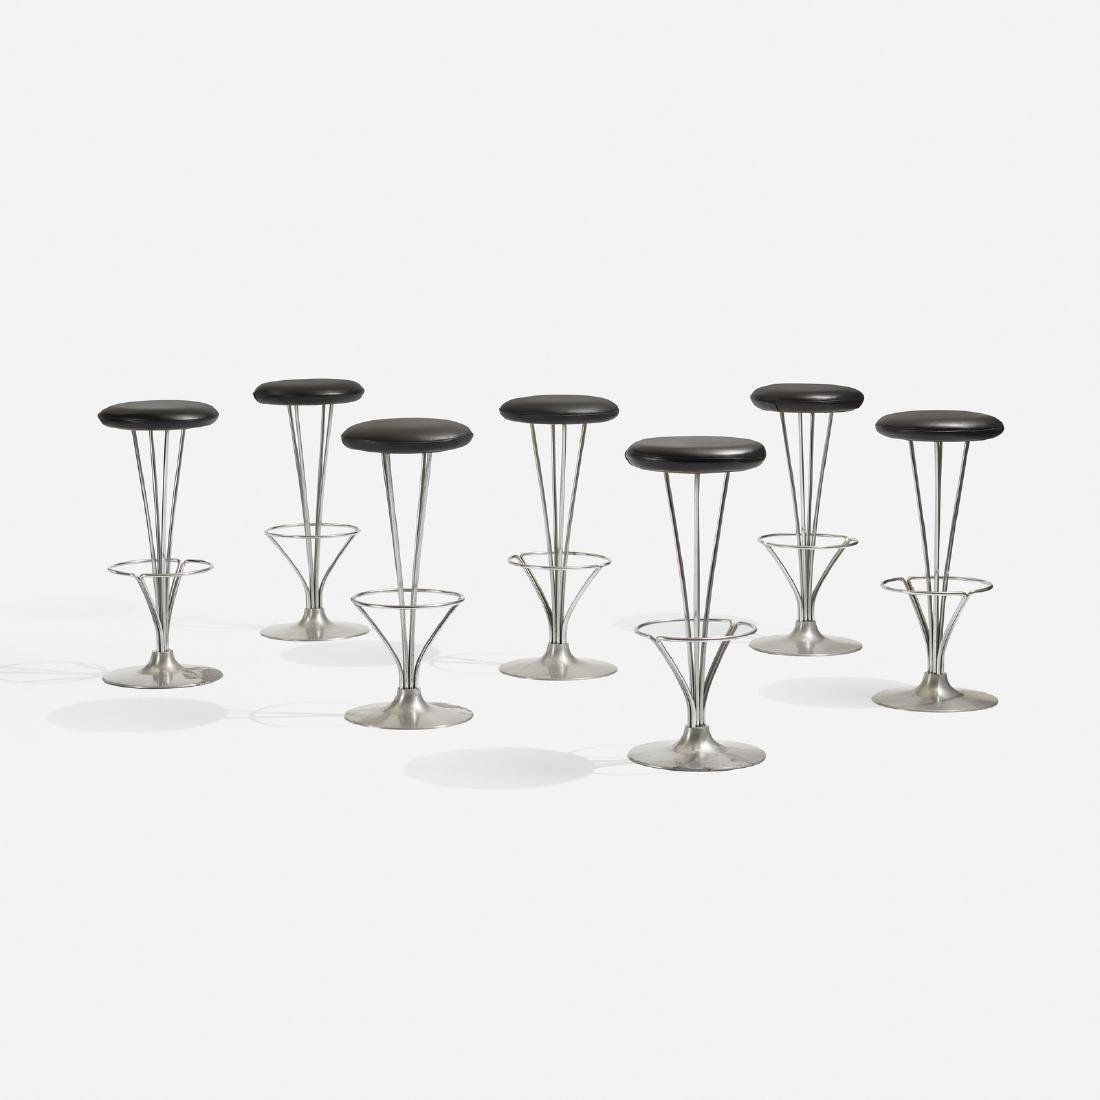 Piet Hein, stools, set of seven